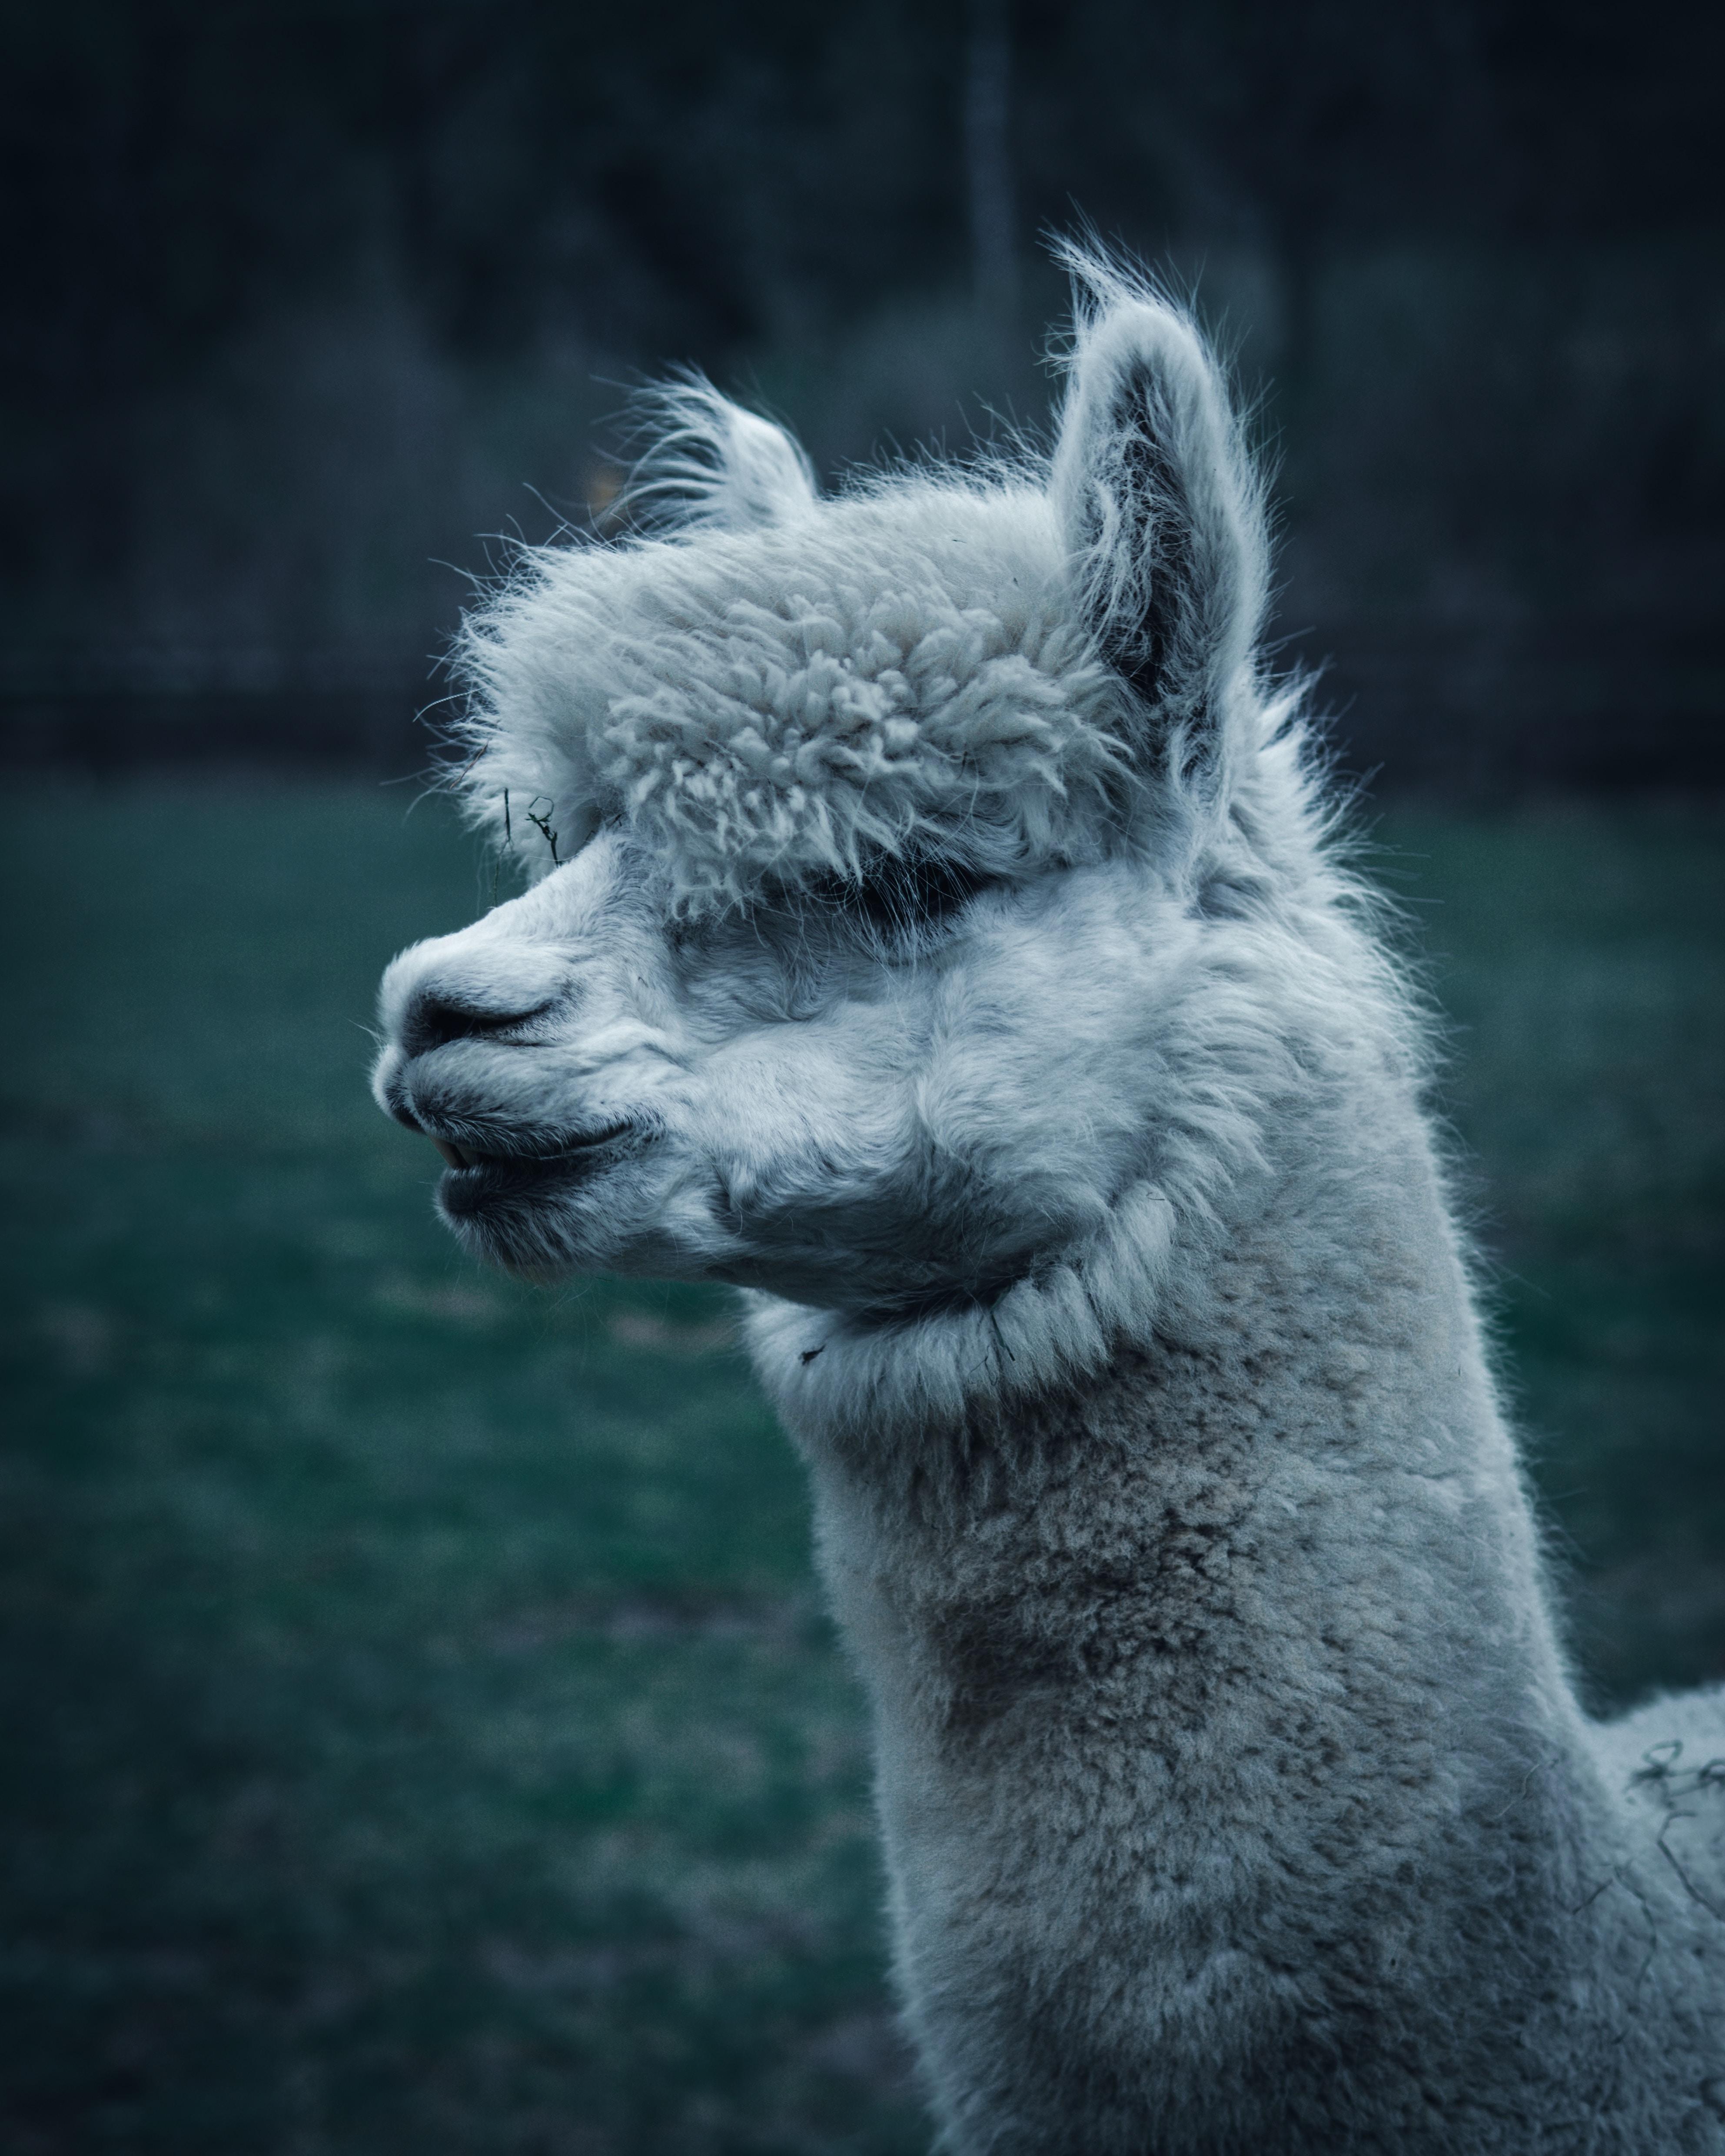 close-up photo of white llama